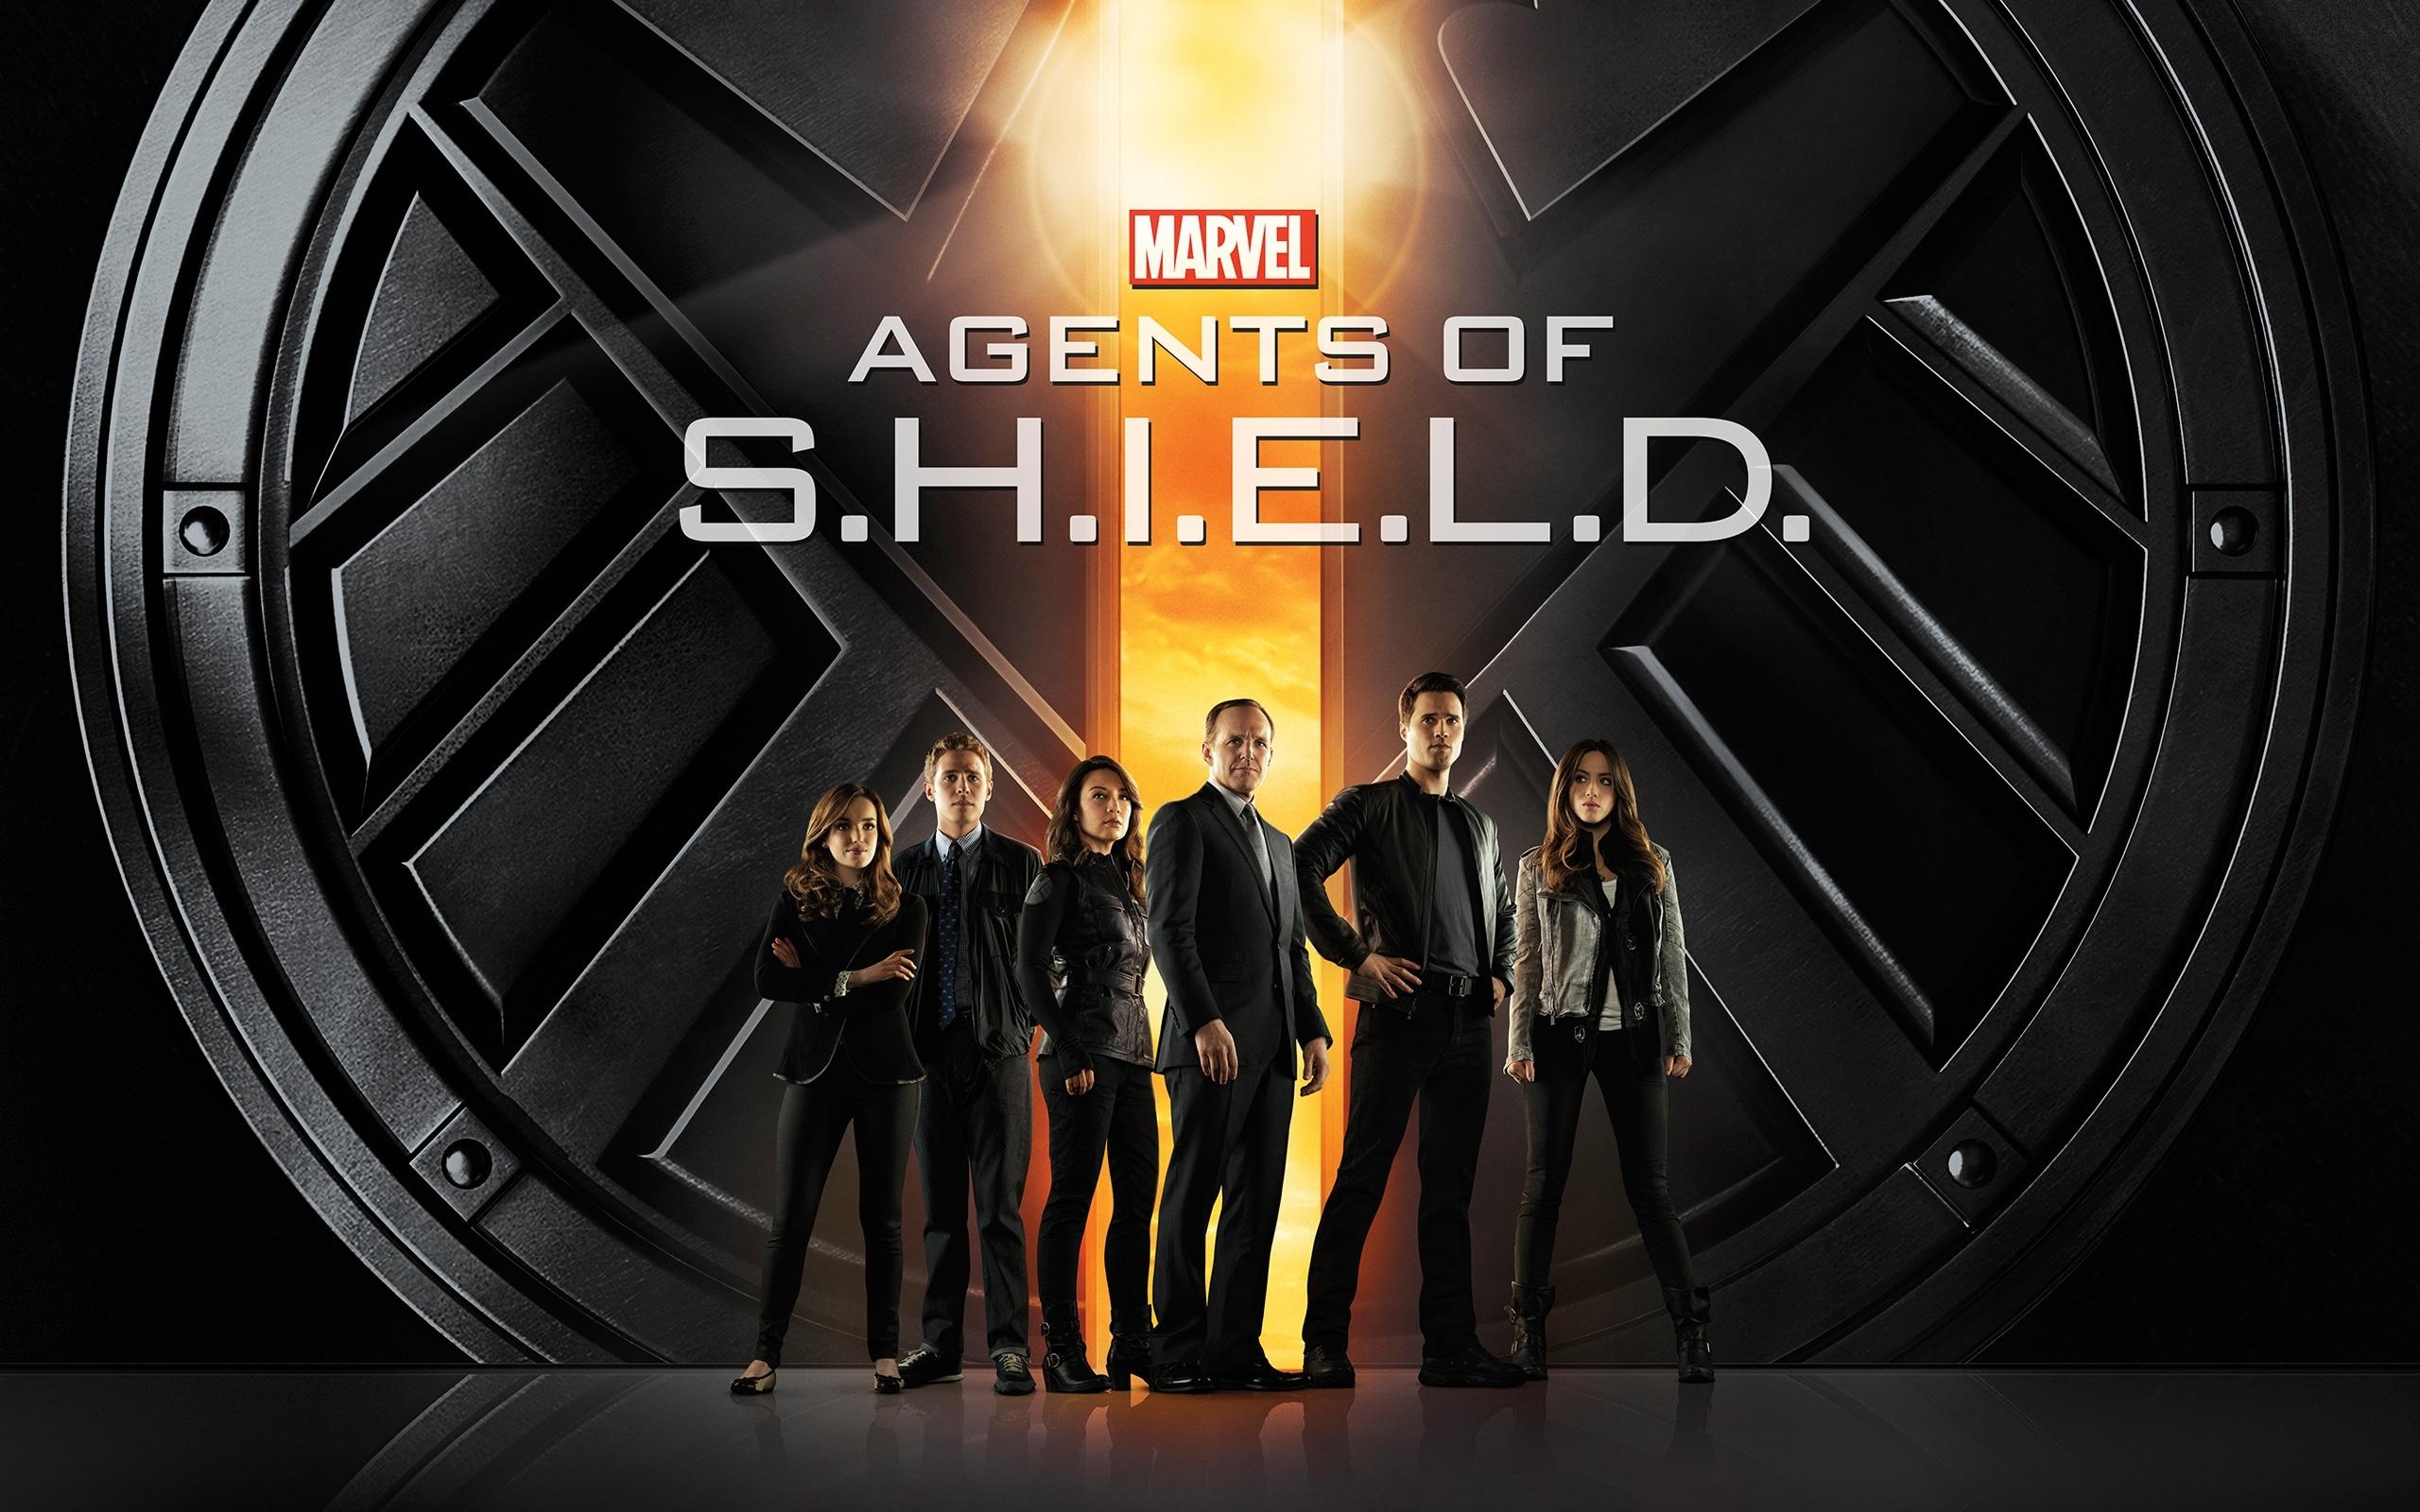 Agents of S.H.I.E.L.D. Season 6 Episode 3